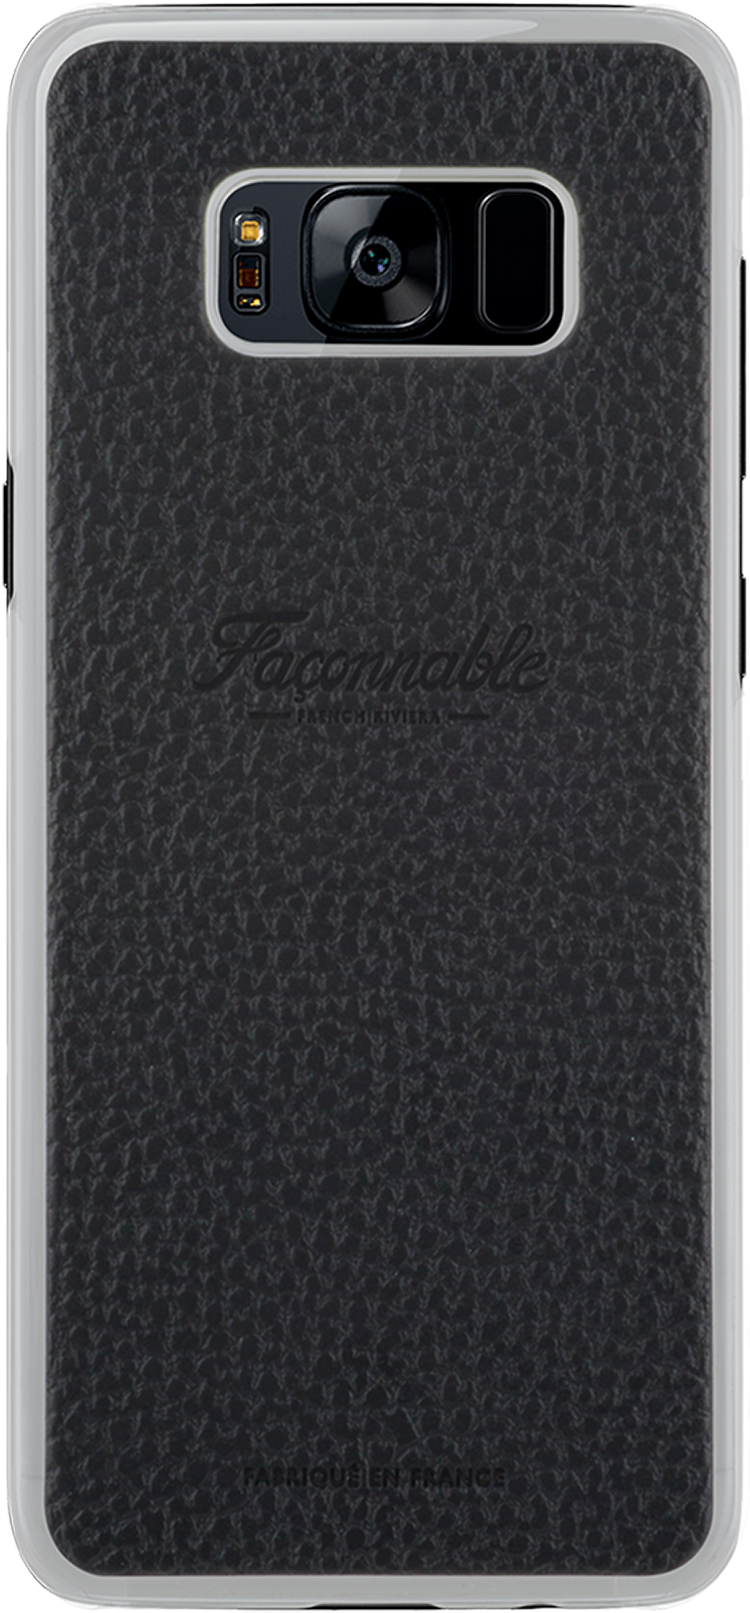 FACONNABLE Hard Case French Riviera (Black) - Packshot